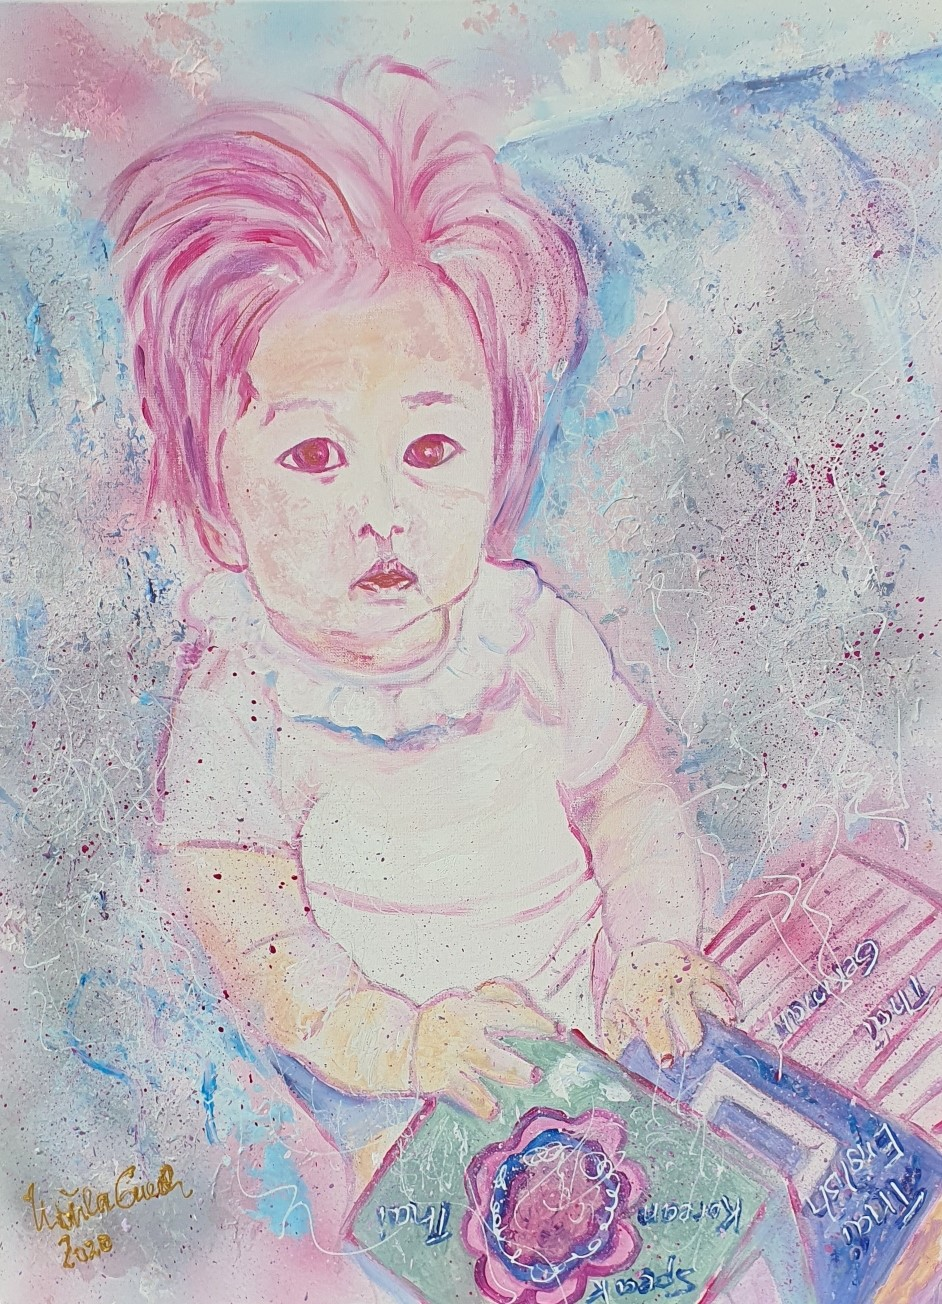 Baby Love (Technic: Acryl/Mixed Media on Canvas 80 X 60 X 1,5 cm)